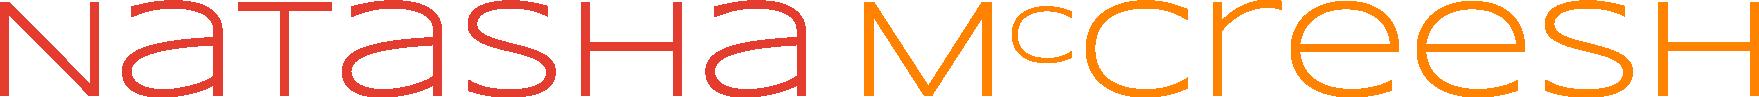 Natasha McCreesh text logo